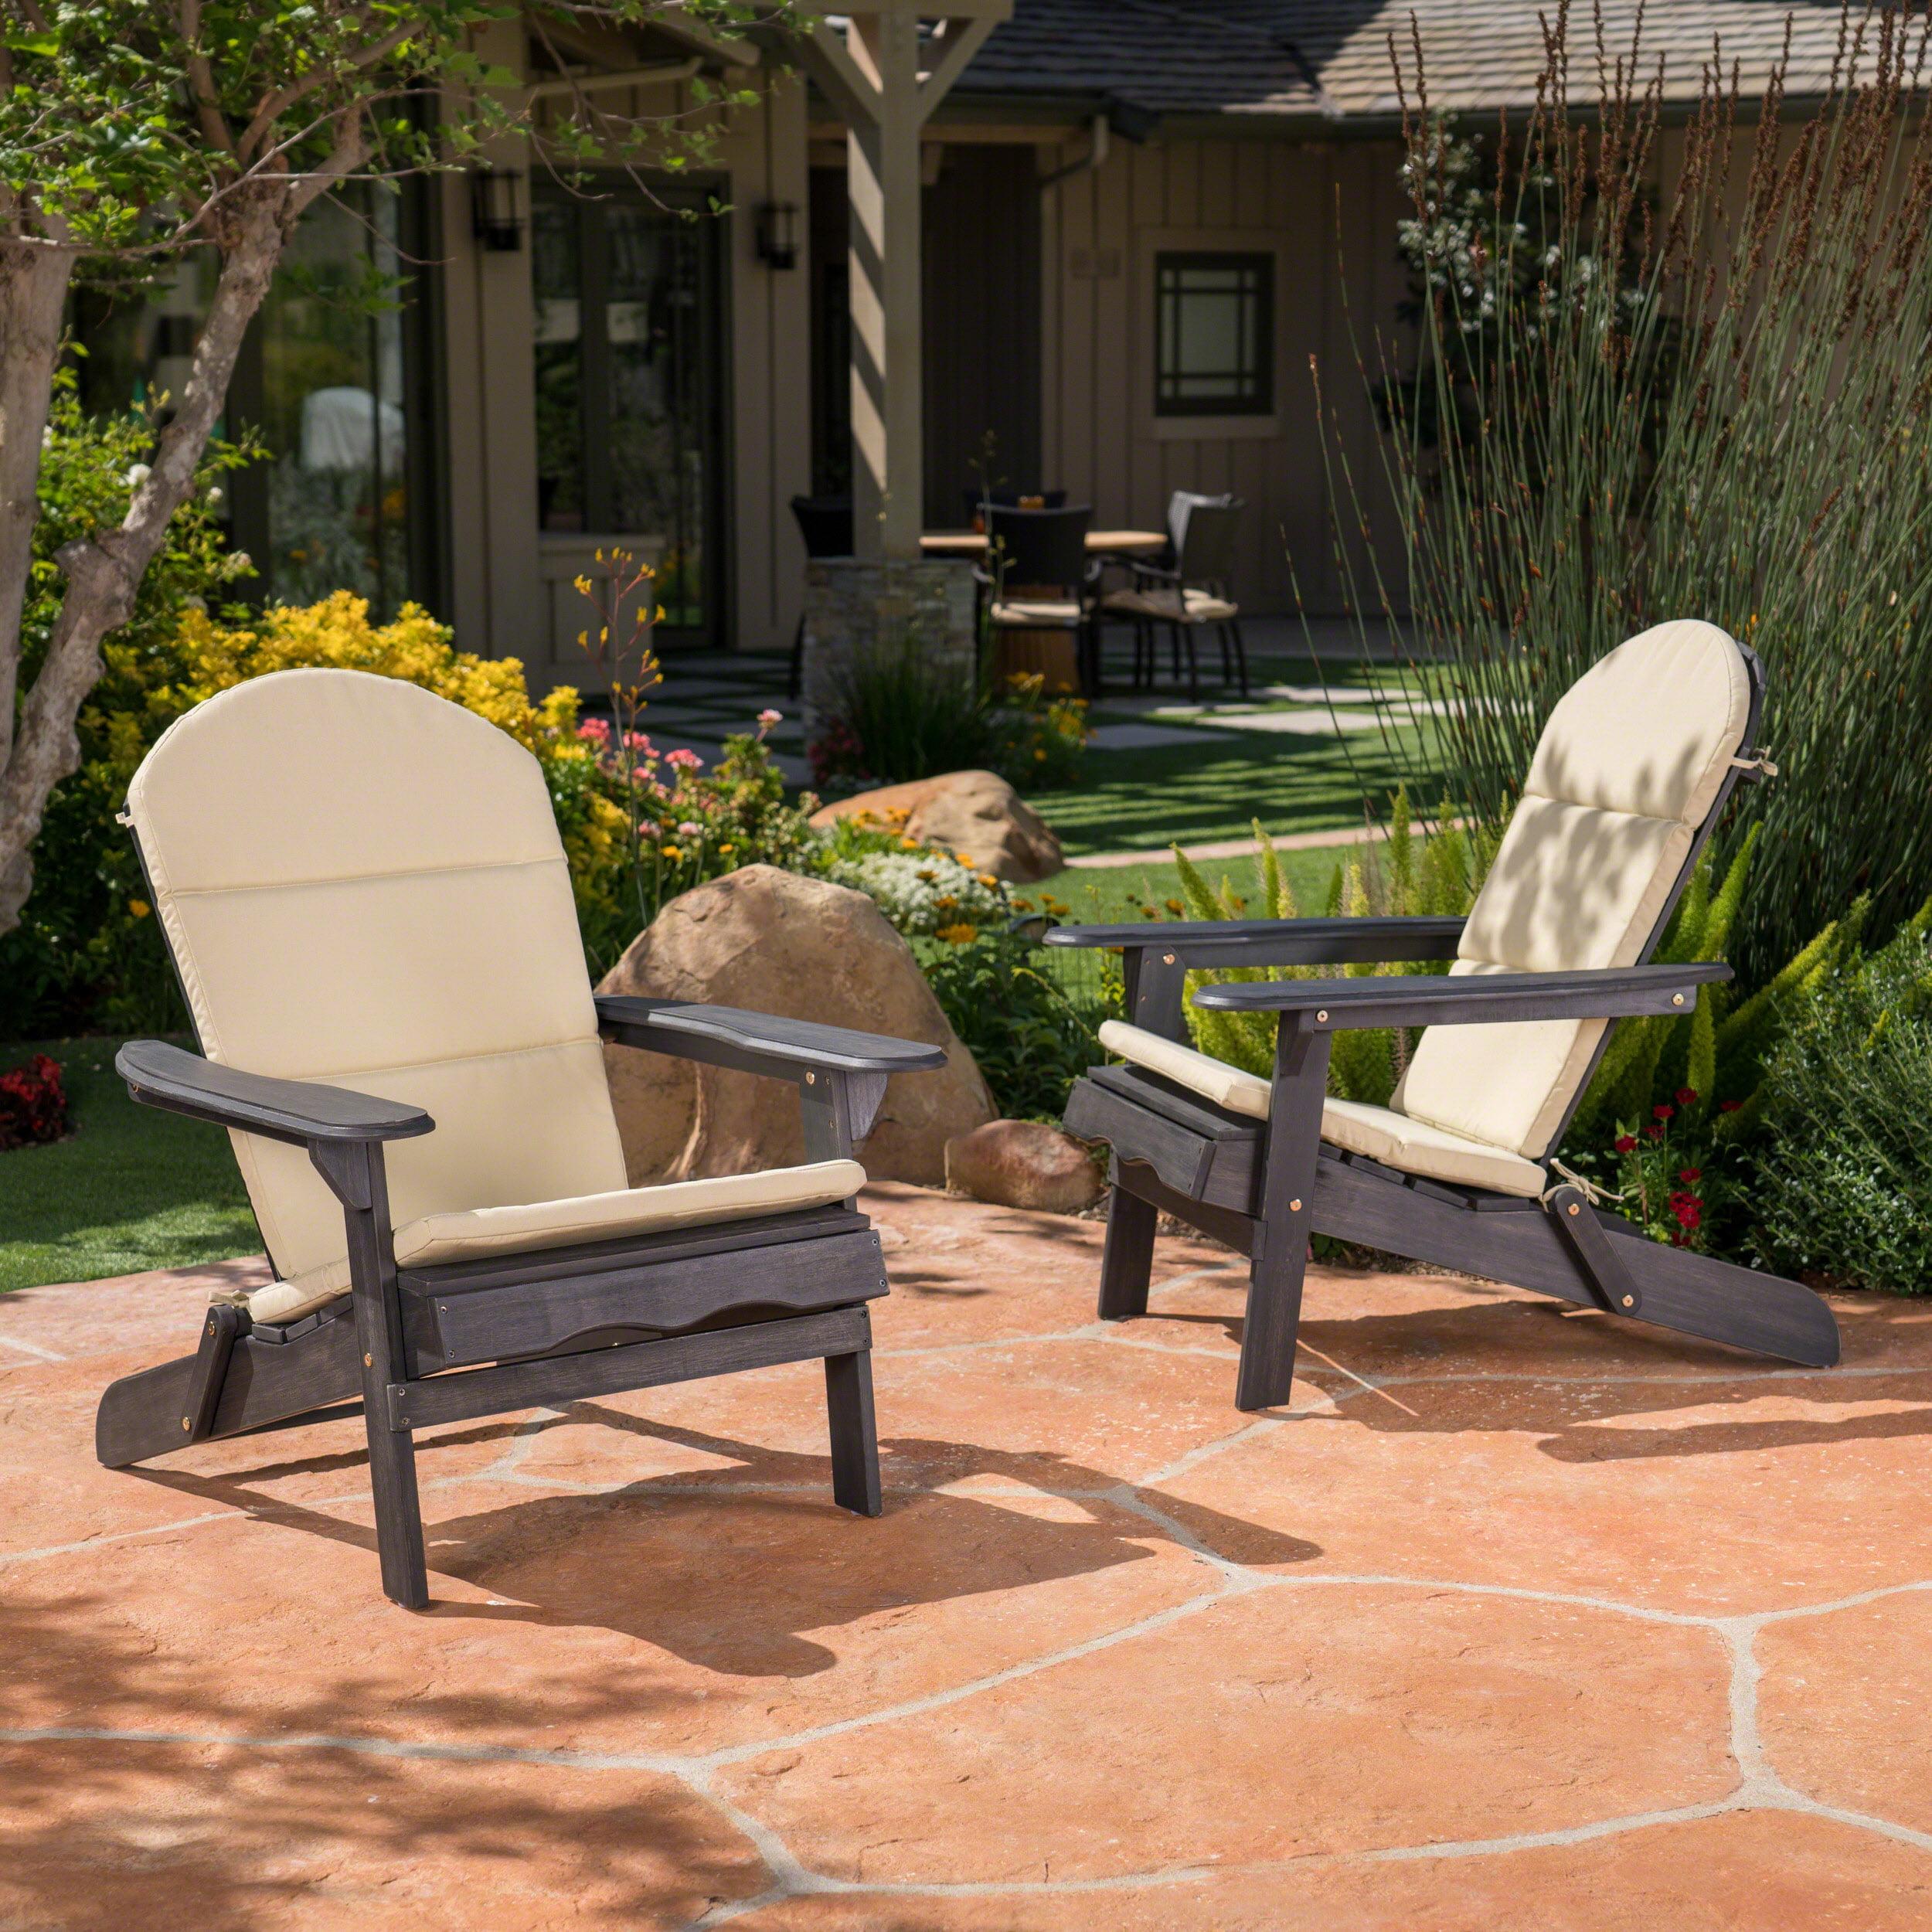 Ariel Outdoor Acacia Wood Adirondack Chairs with Cushions, Set of 2, Dark Grey, Khaki